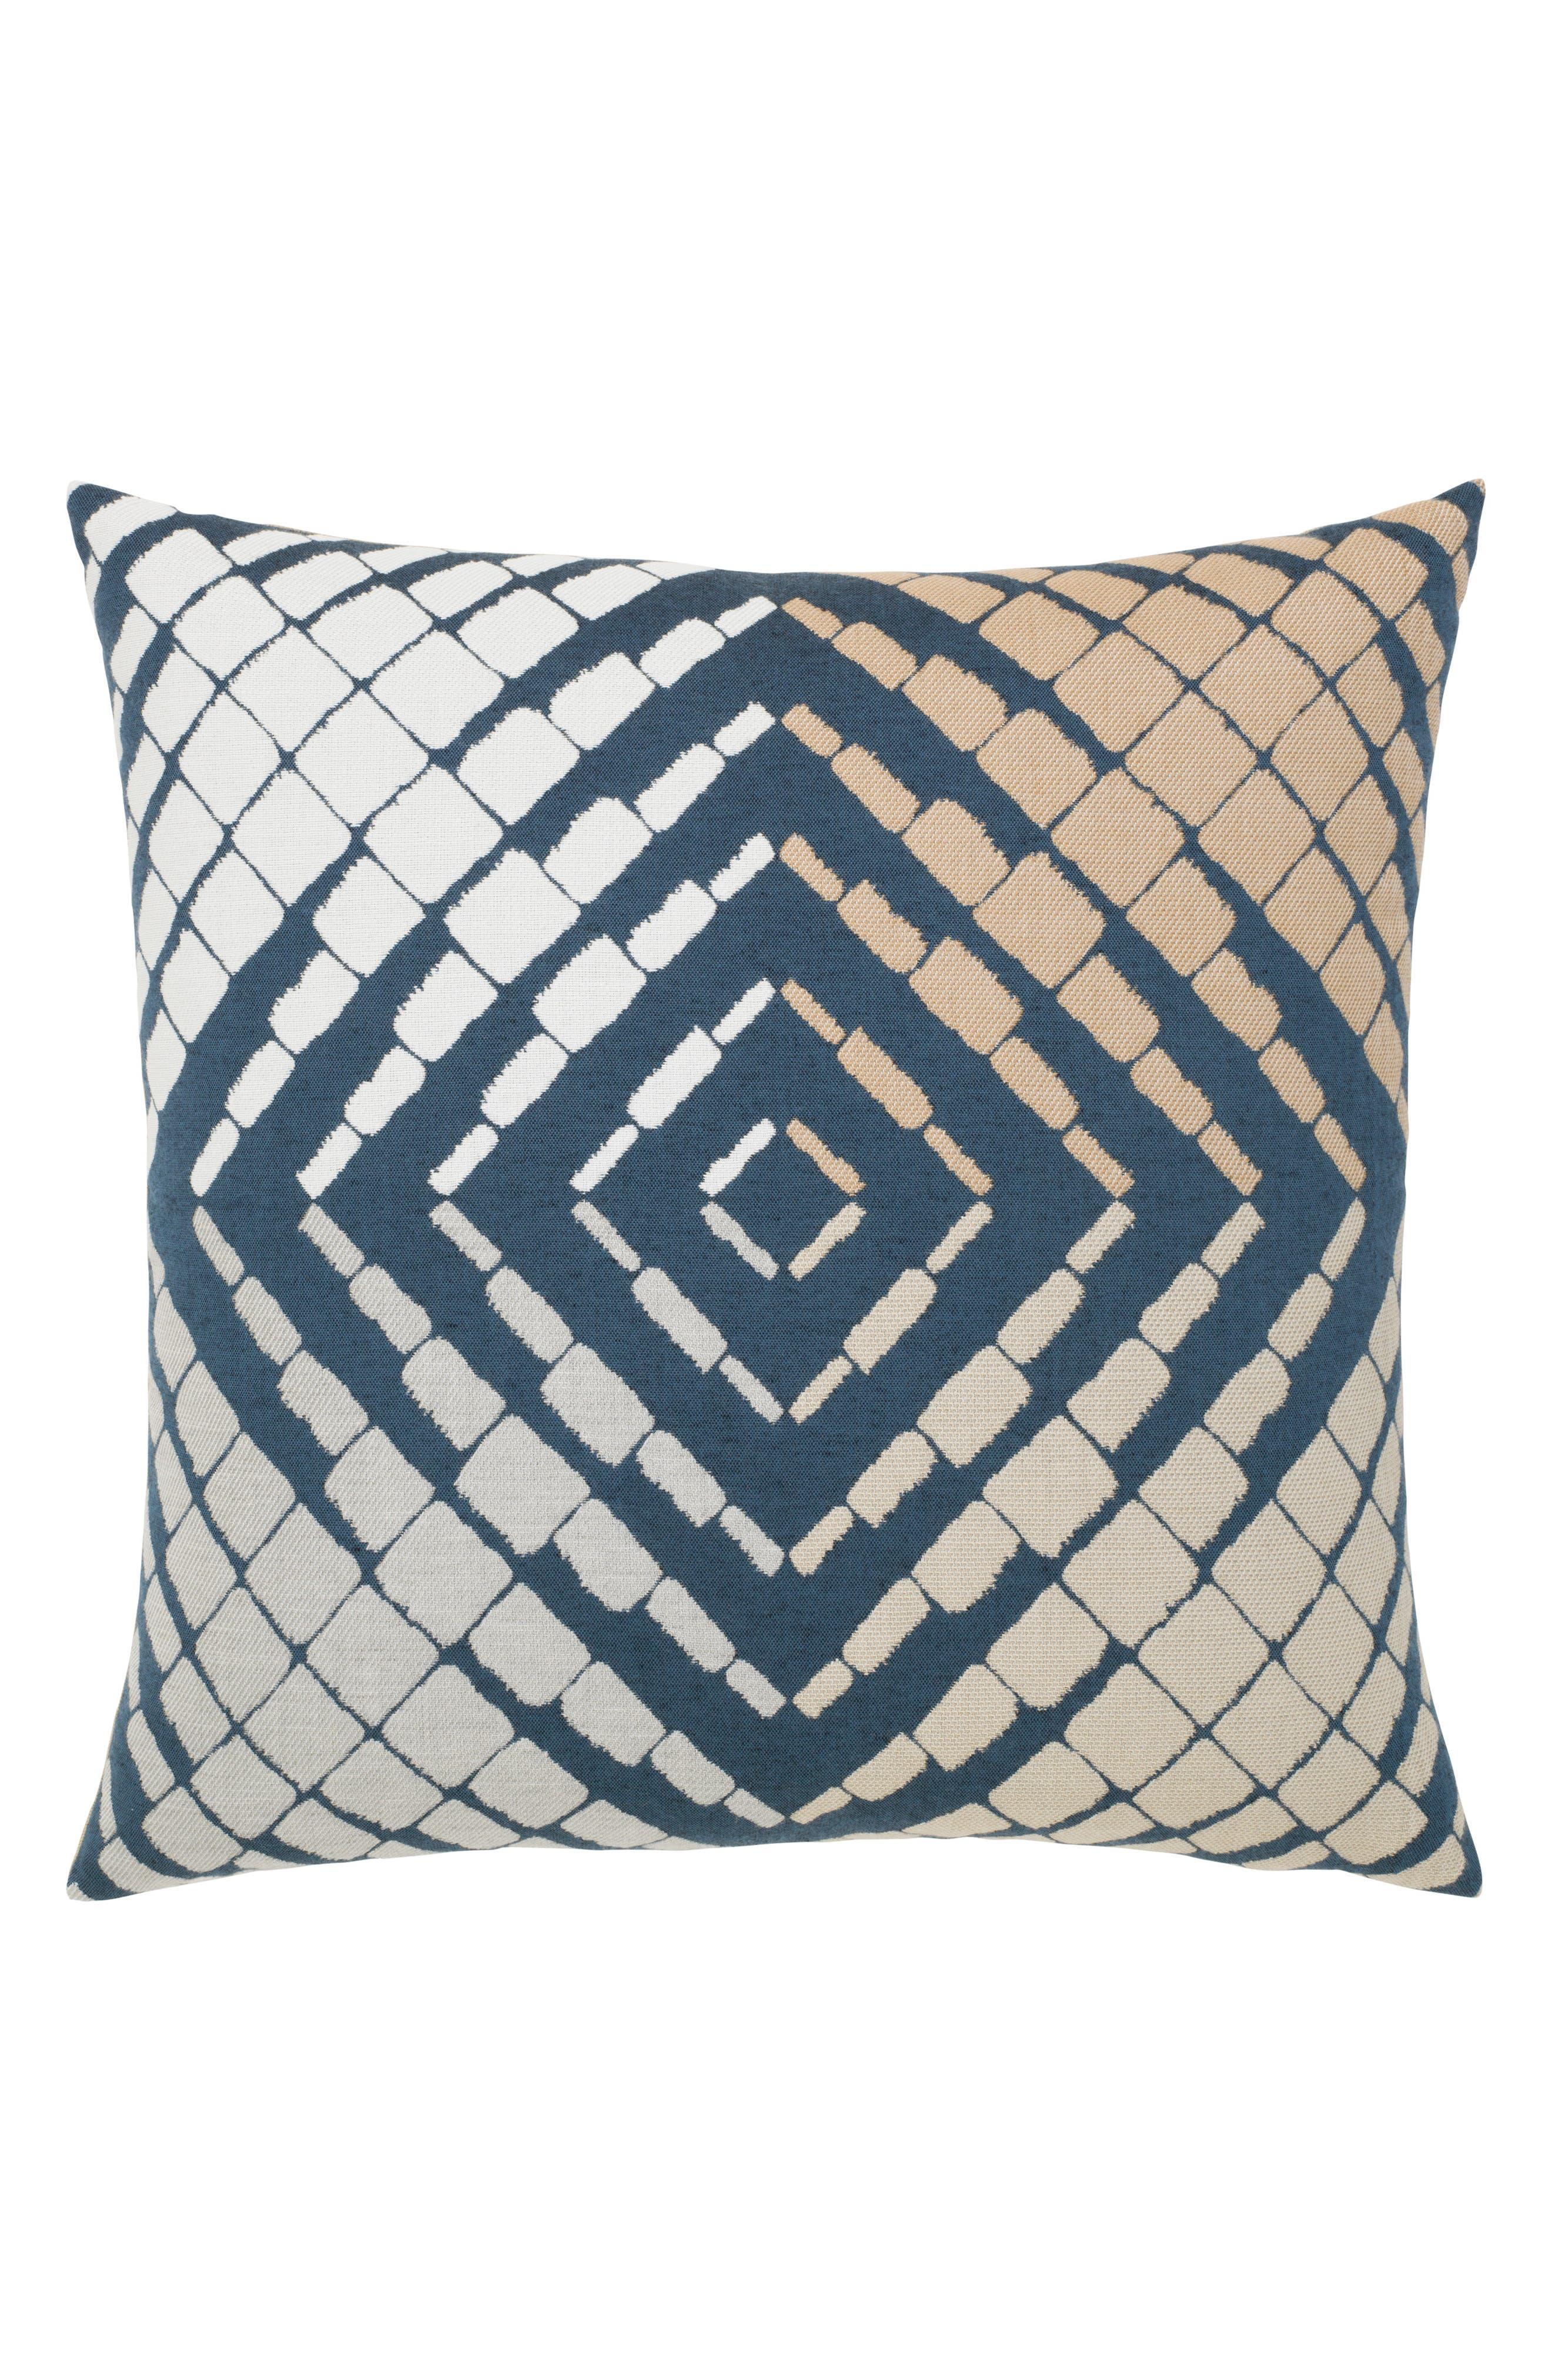 Progression Accent Pillow,                         Main,                         color, BLUE/ BROWN